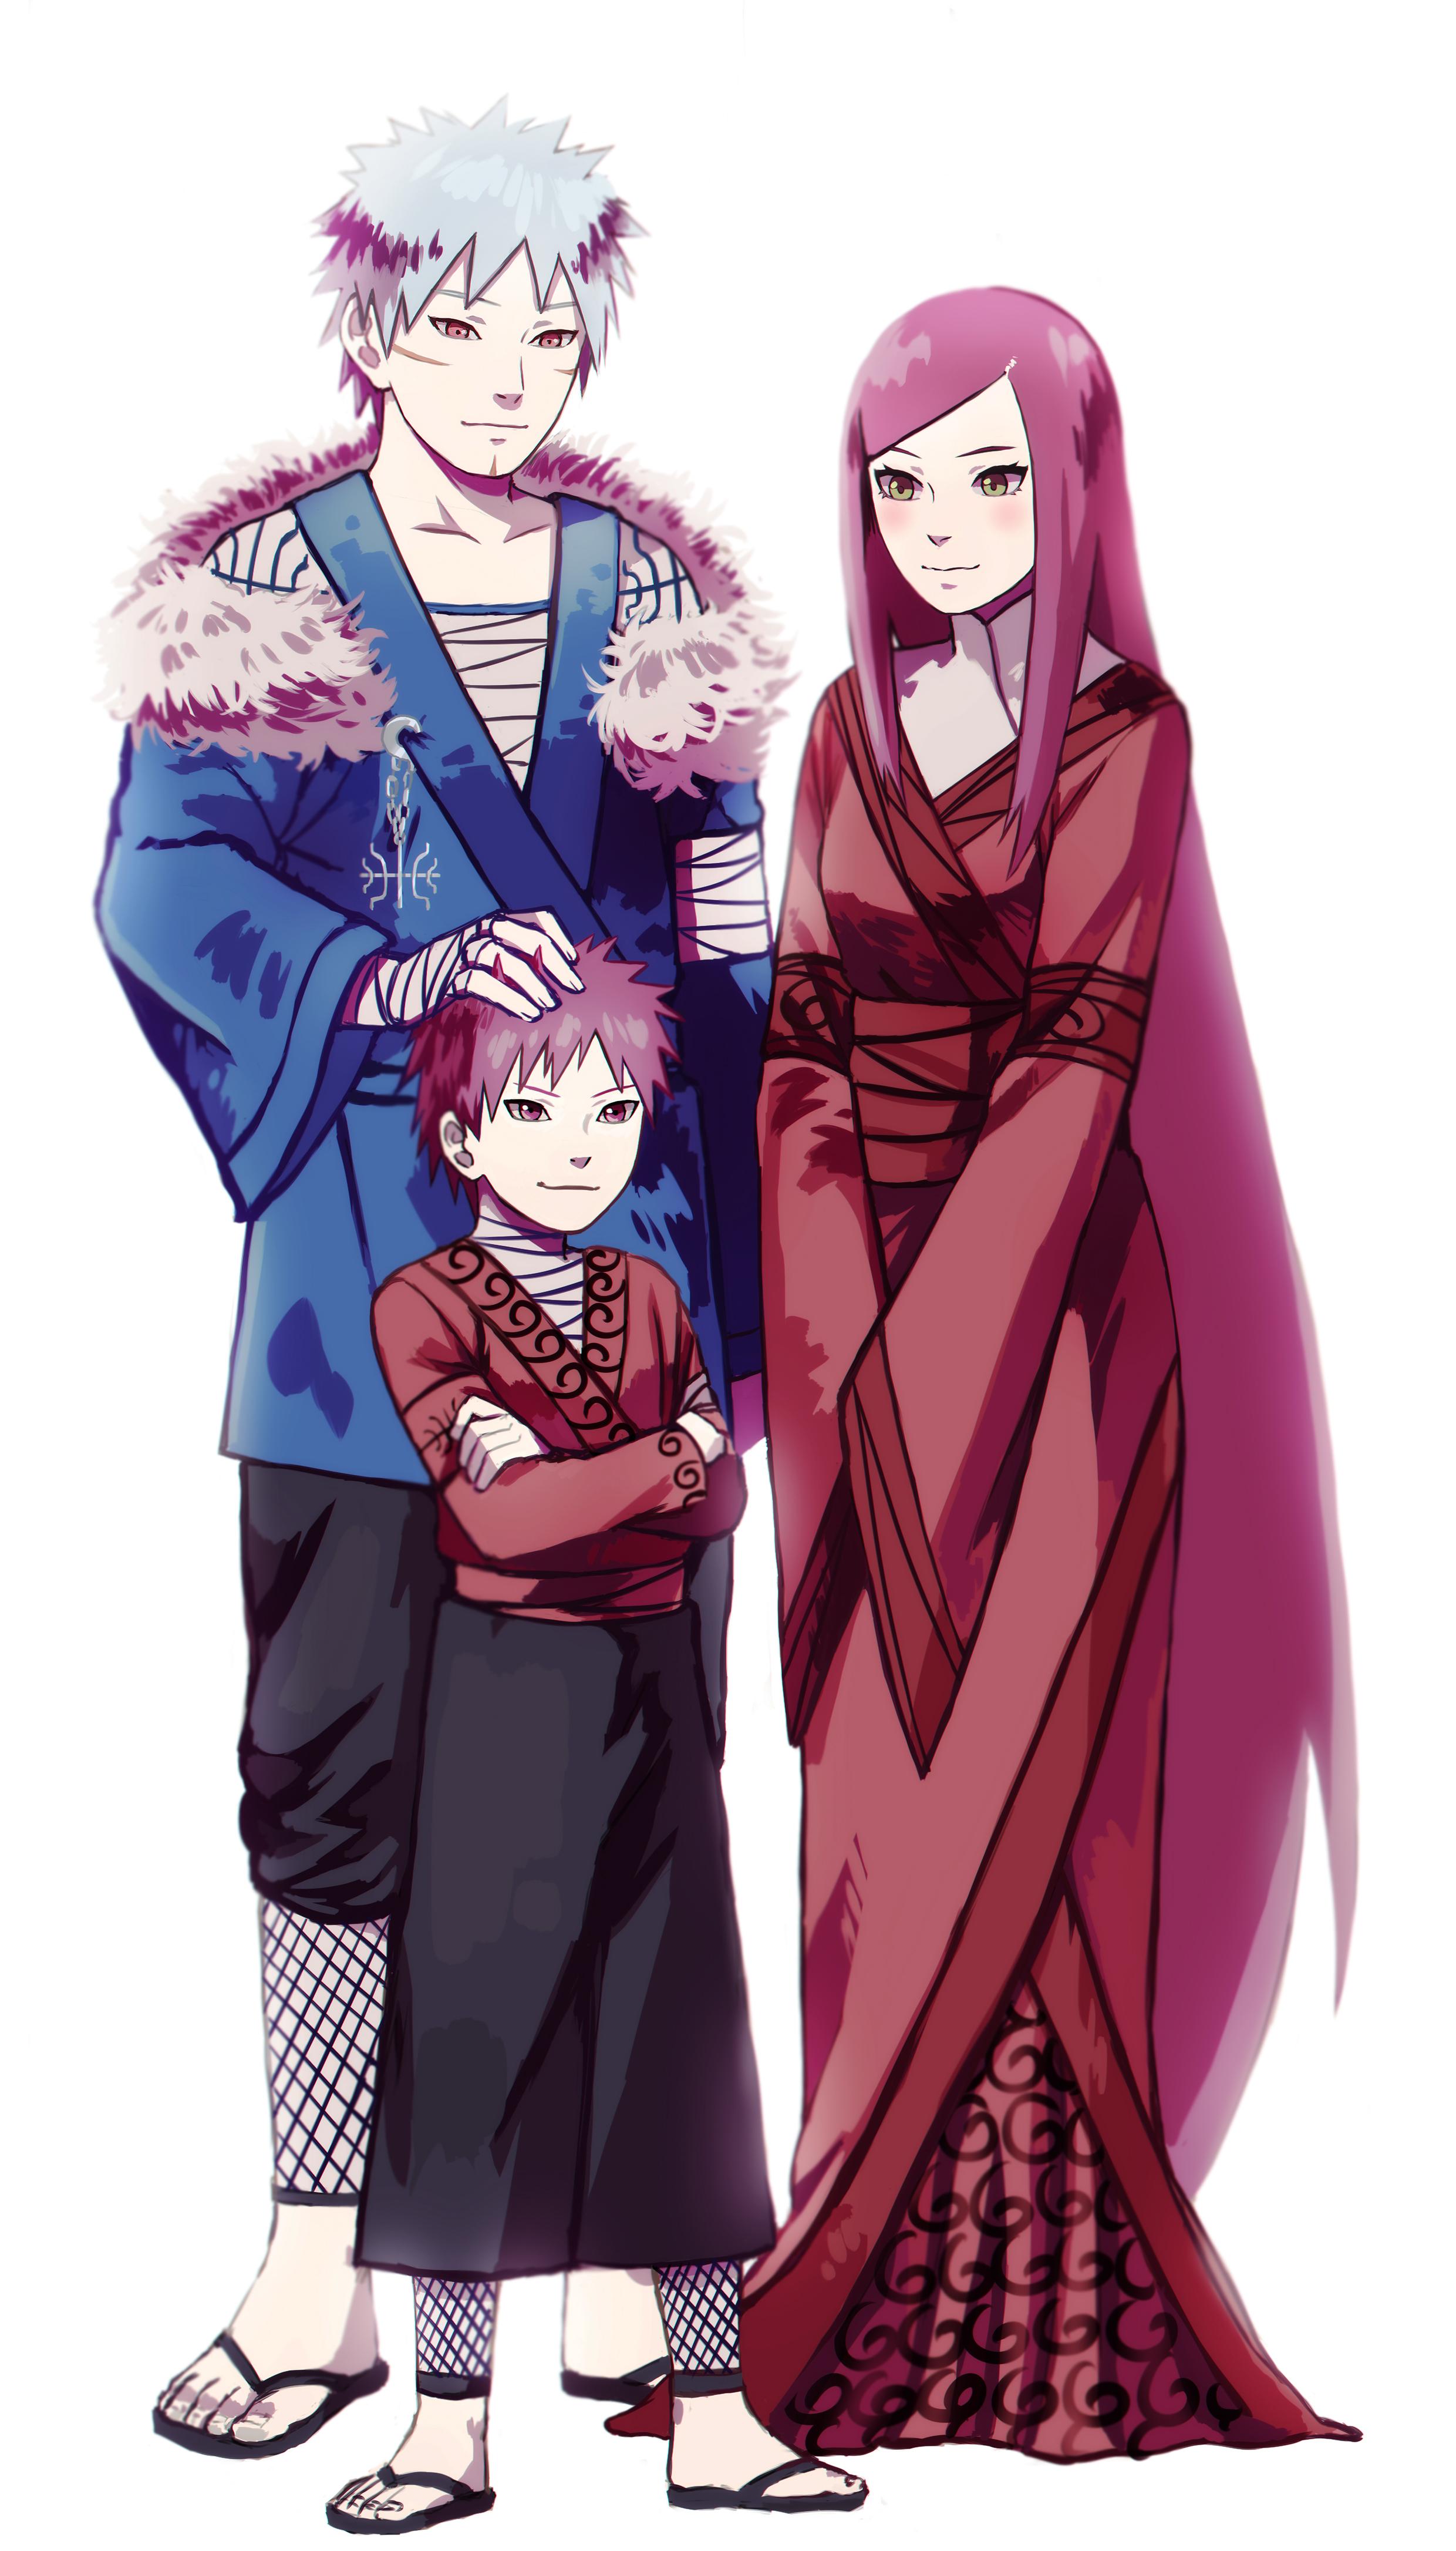 Tobirama Senju Himeko Uzumaki And Their Son By Mrsoomori On Deviantart